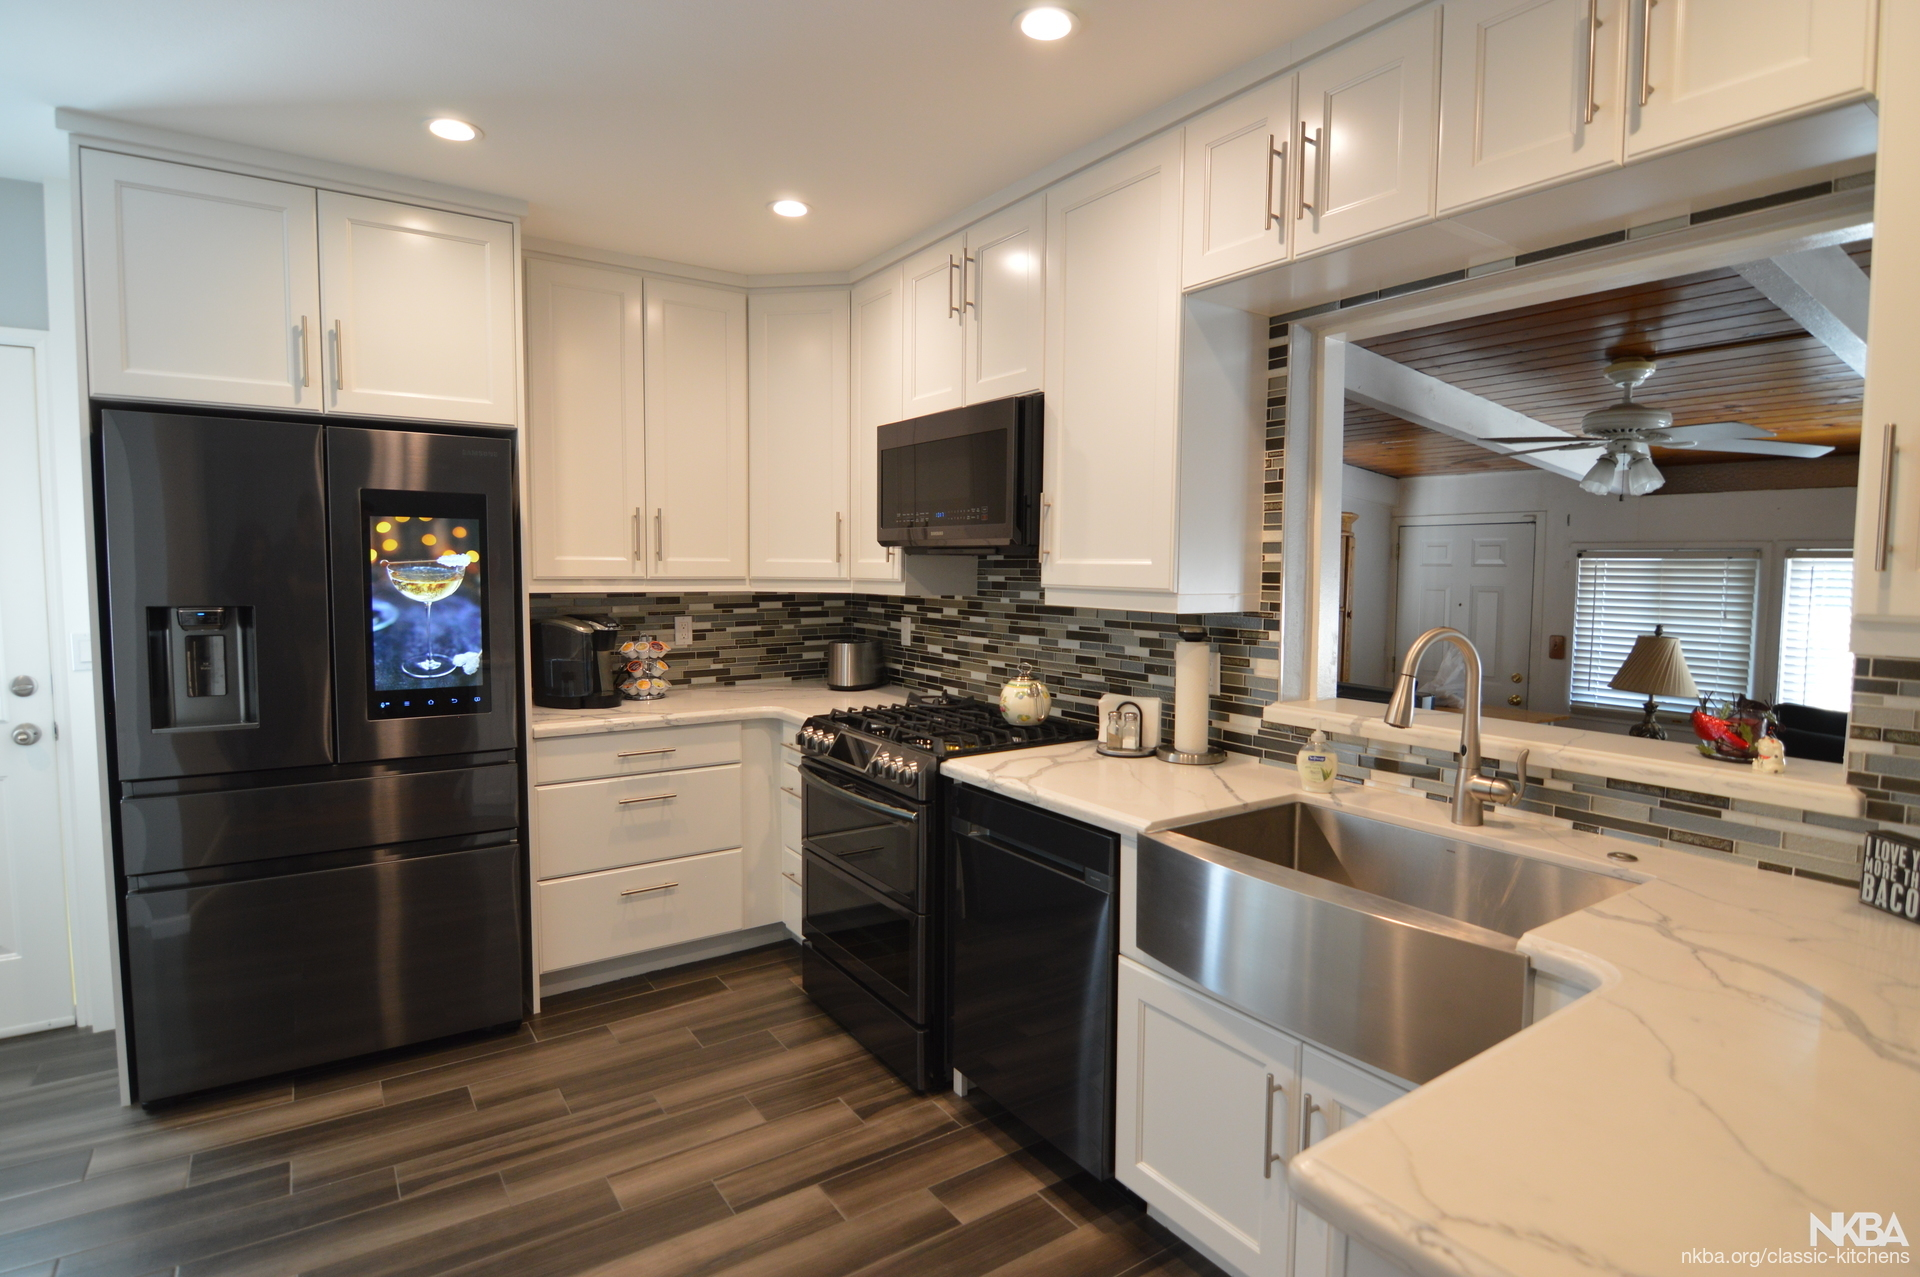 West Covina, CA - Modern Kitchen Remodel - NKBA on Modern Kitchen Remodel  id=62044